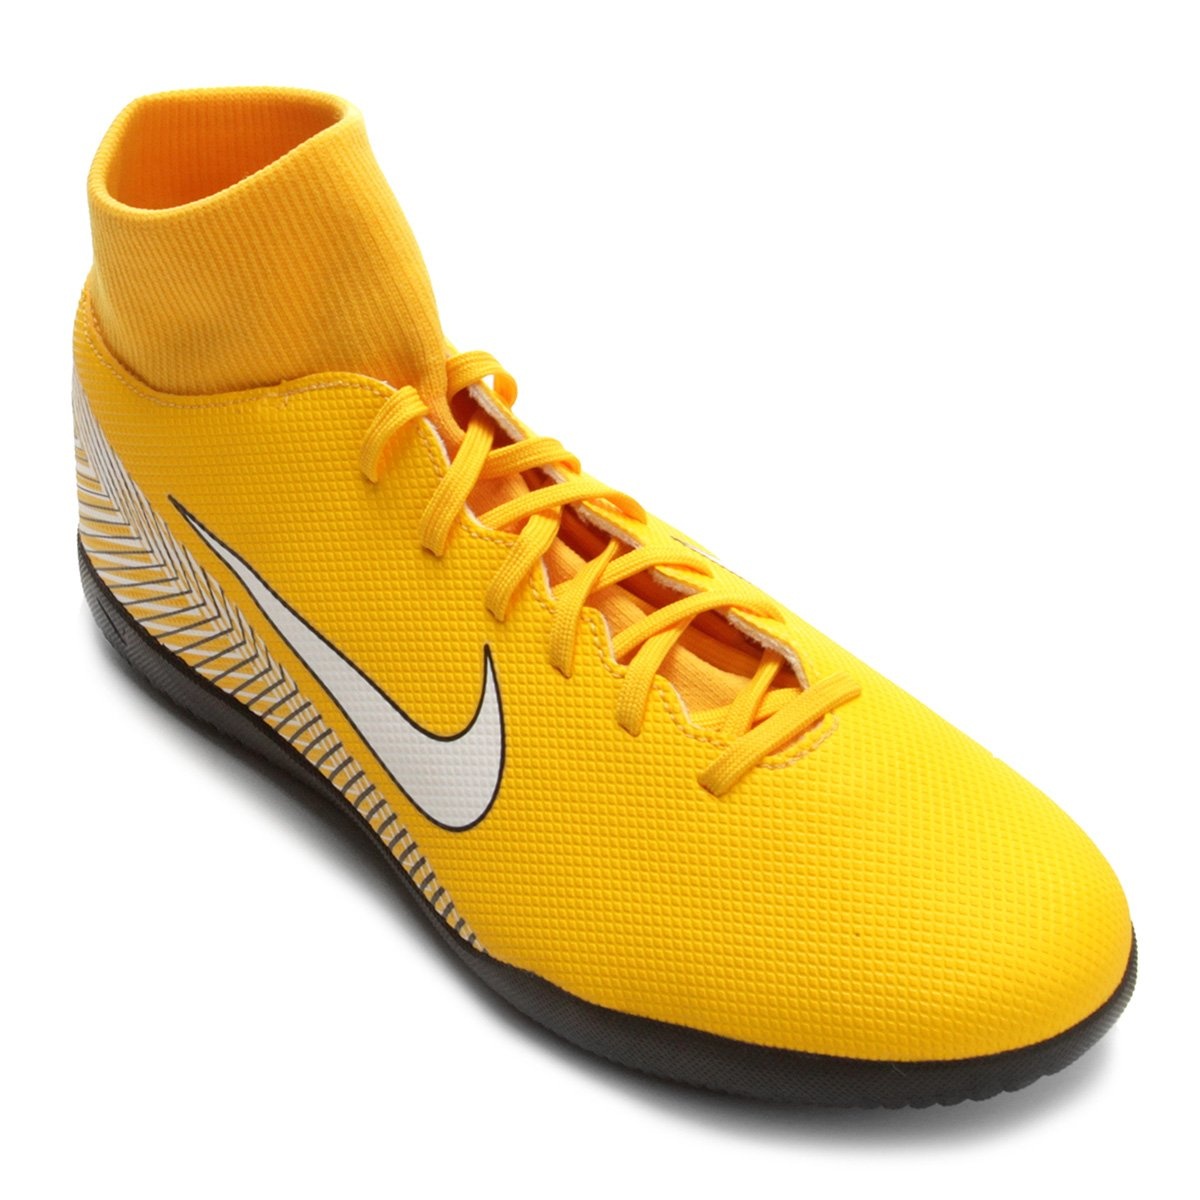 IC e Futsal Superfly Amarelo Mercurial 6 Nike Preto Chuteira Neymar Club Masculina 7vxn0d